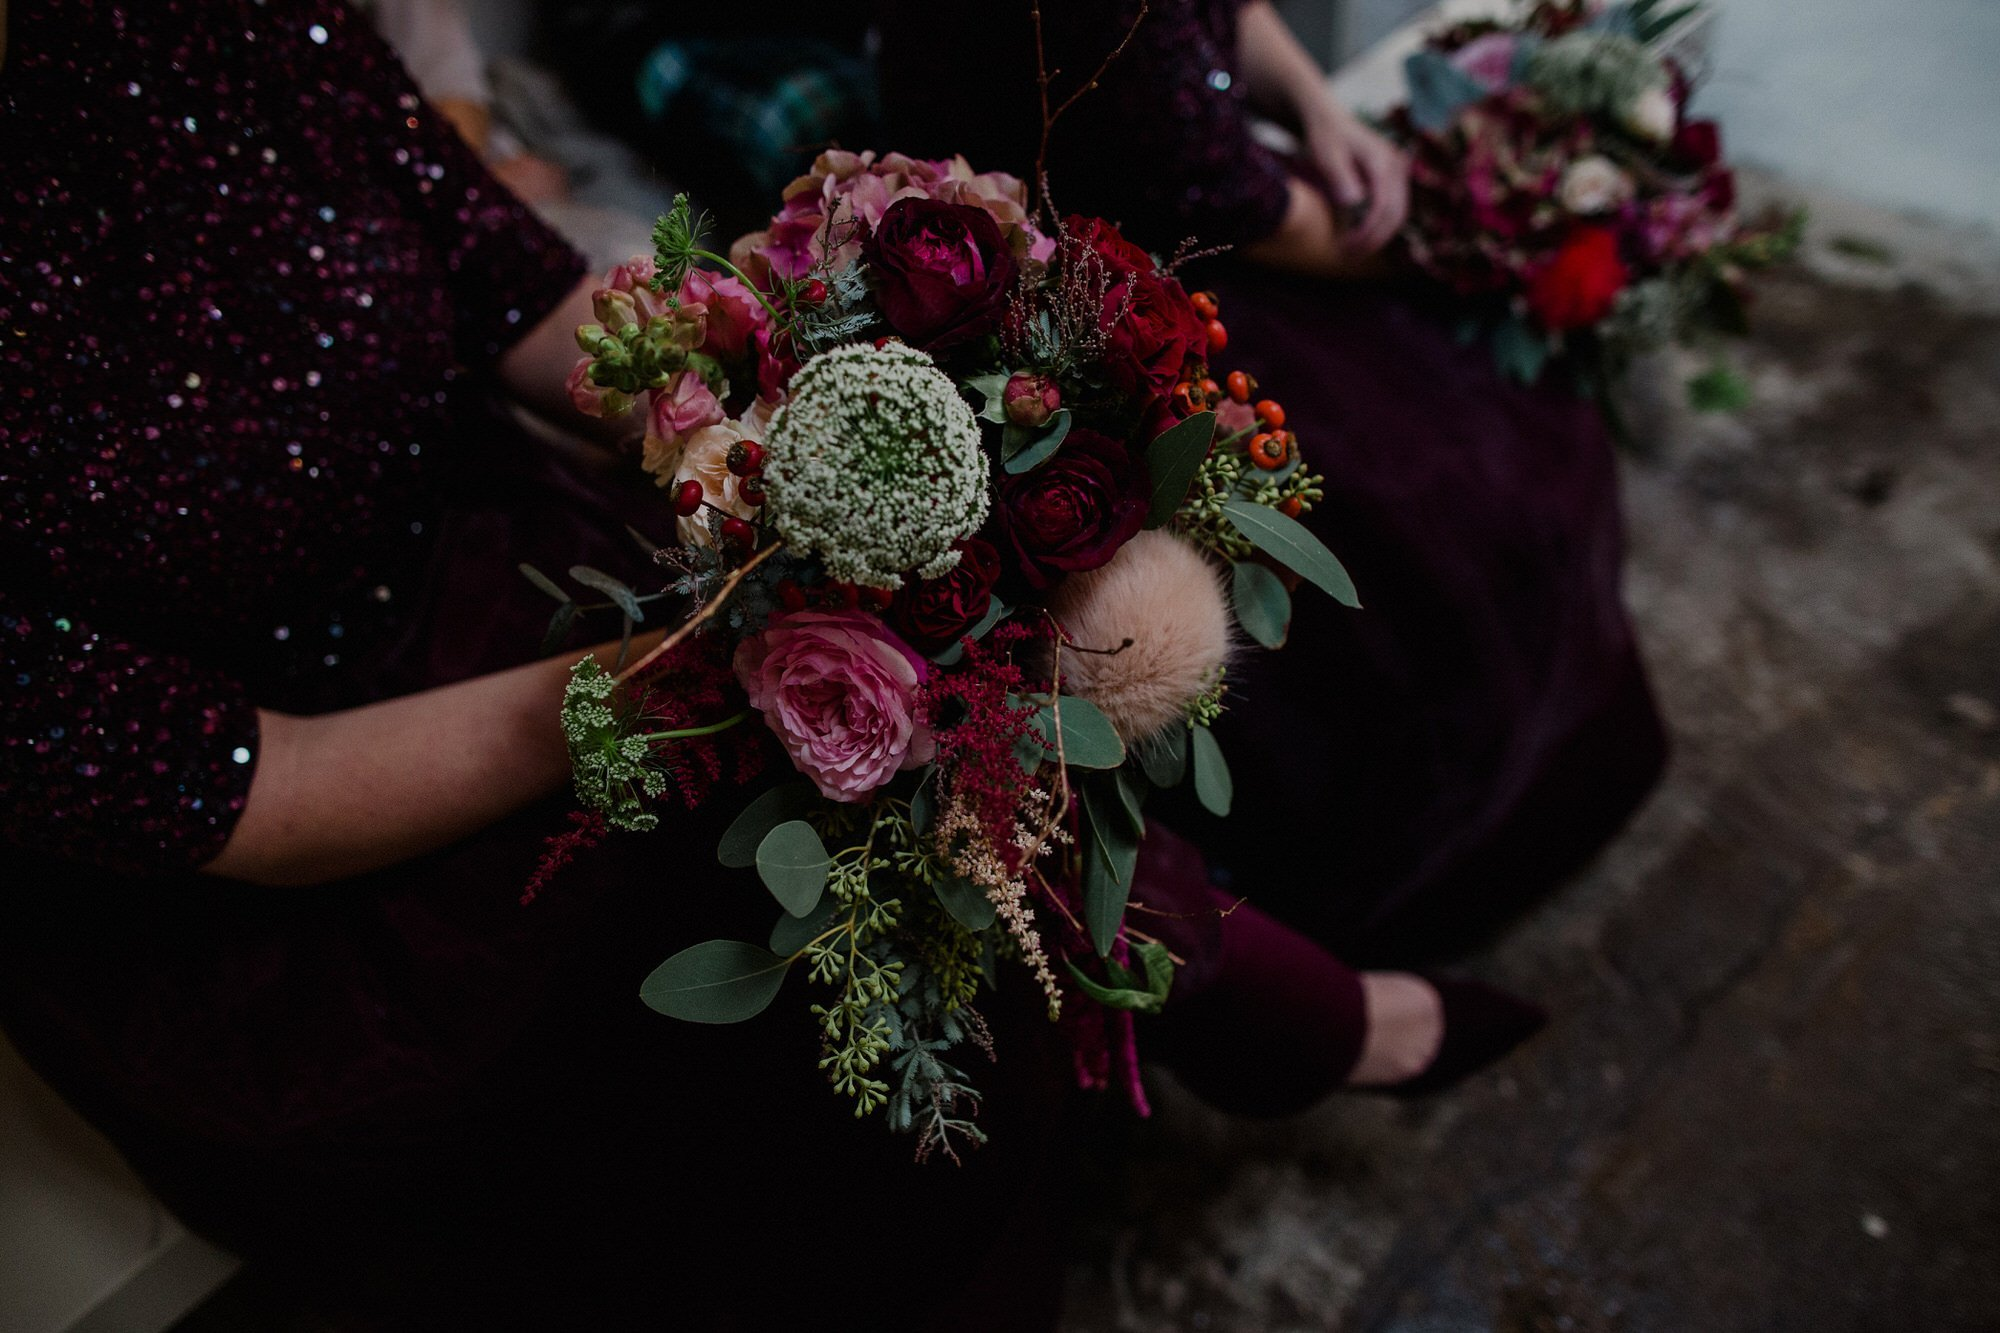 024 TIN SHED KNOCKRAICH FARM WEDDING ALTERNATIVE BRIDE ZOE ALEXANDRA PHOTOGRAPHY